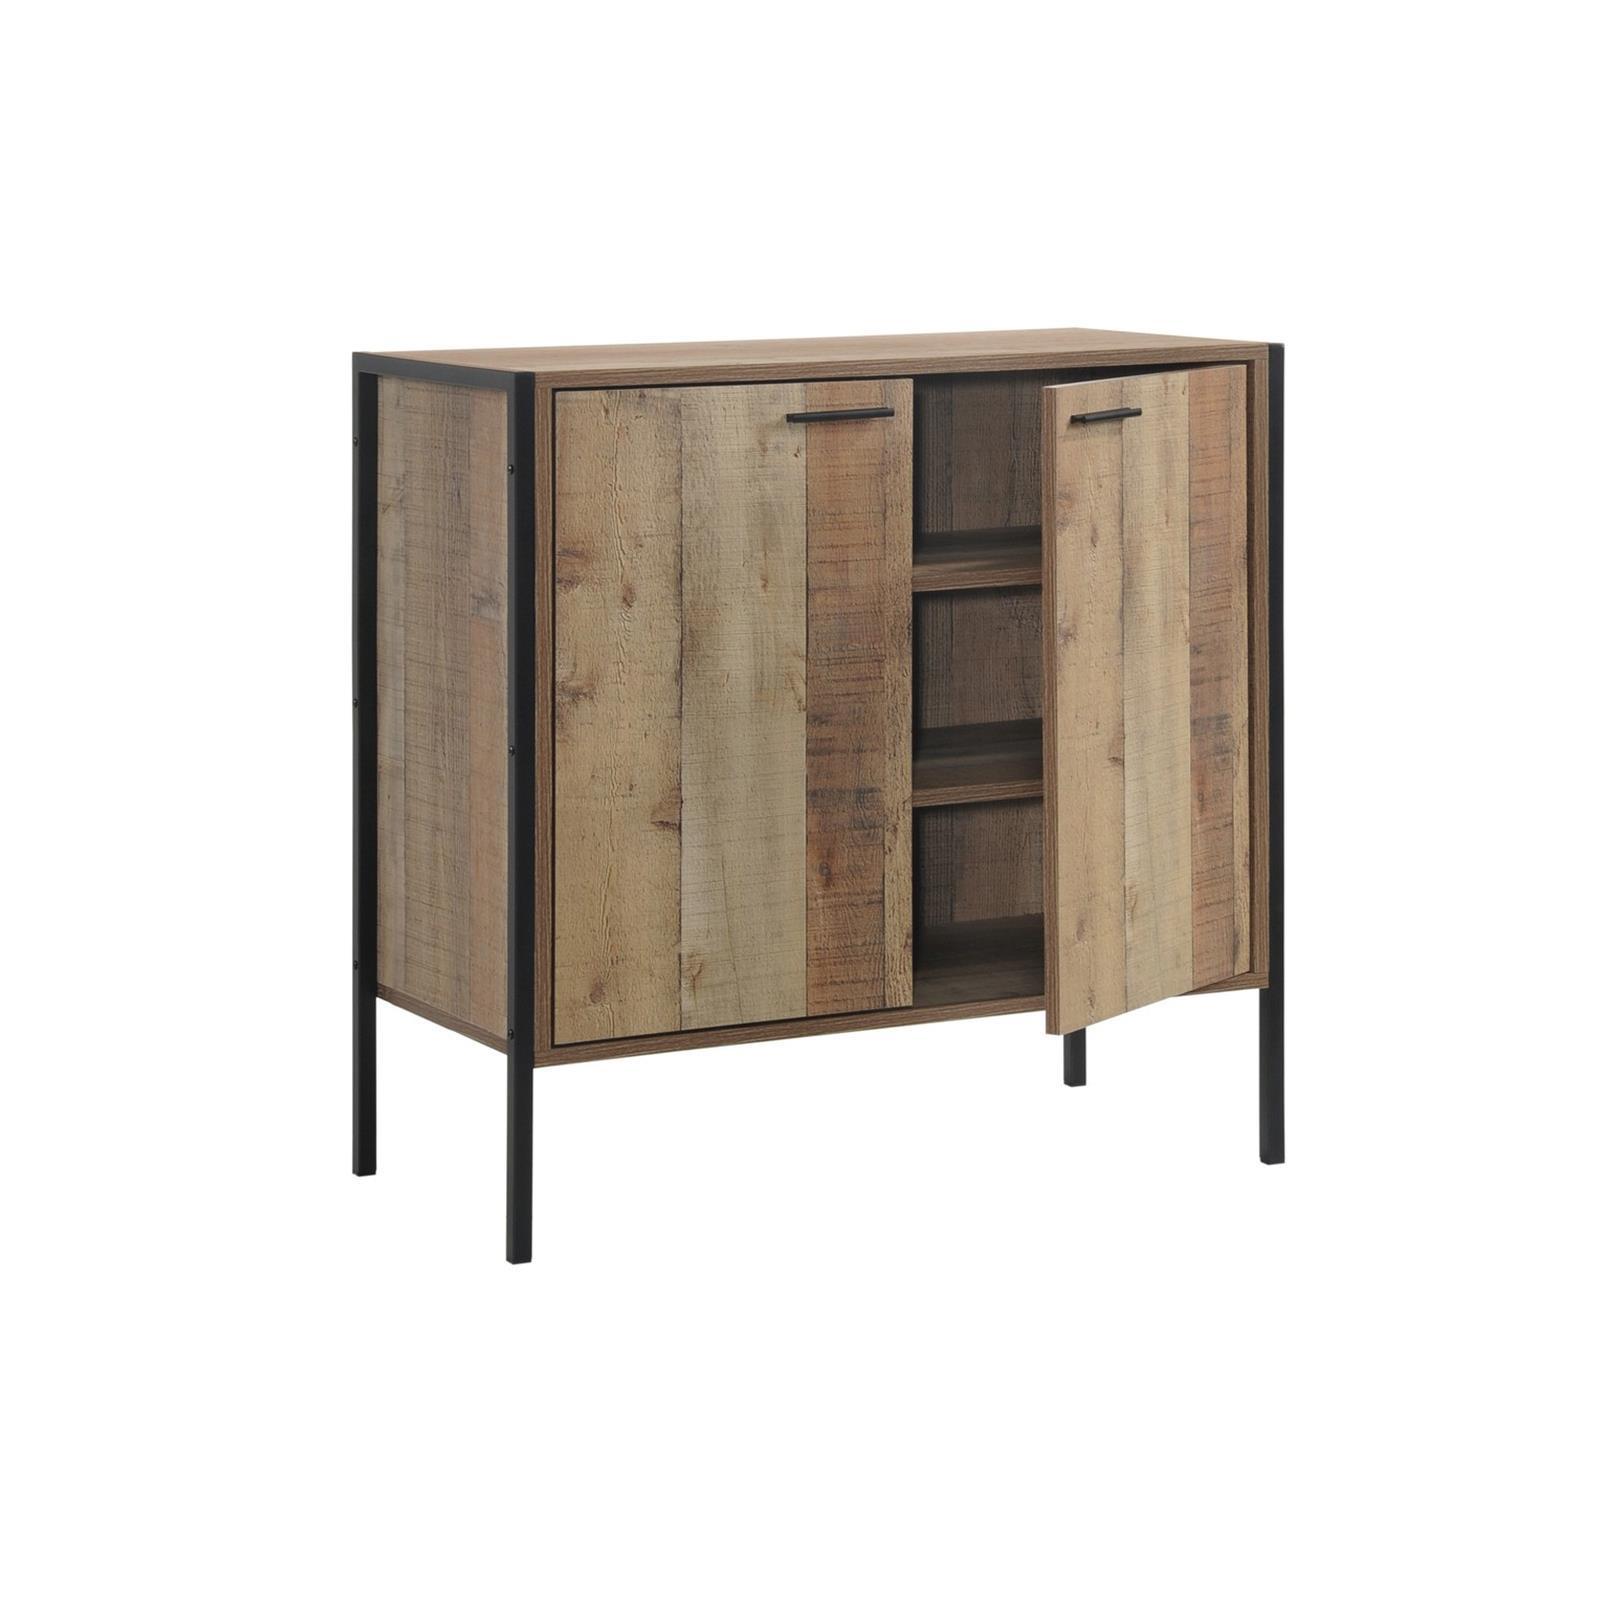 PALLET-W παπουτσοθήκη-ντουλάπι με 3 ράφια antique oak Y80x80x40εκ.